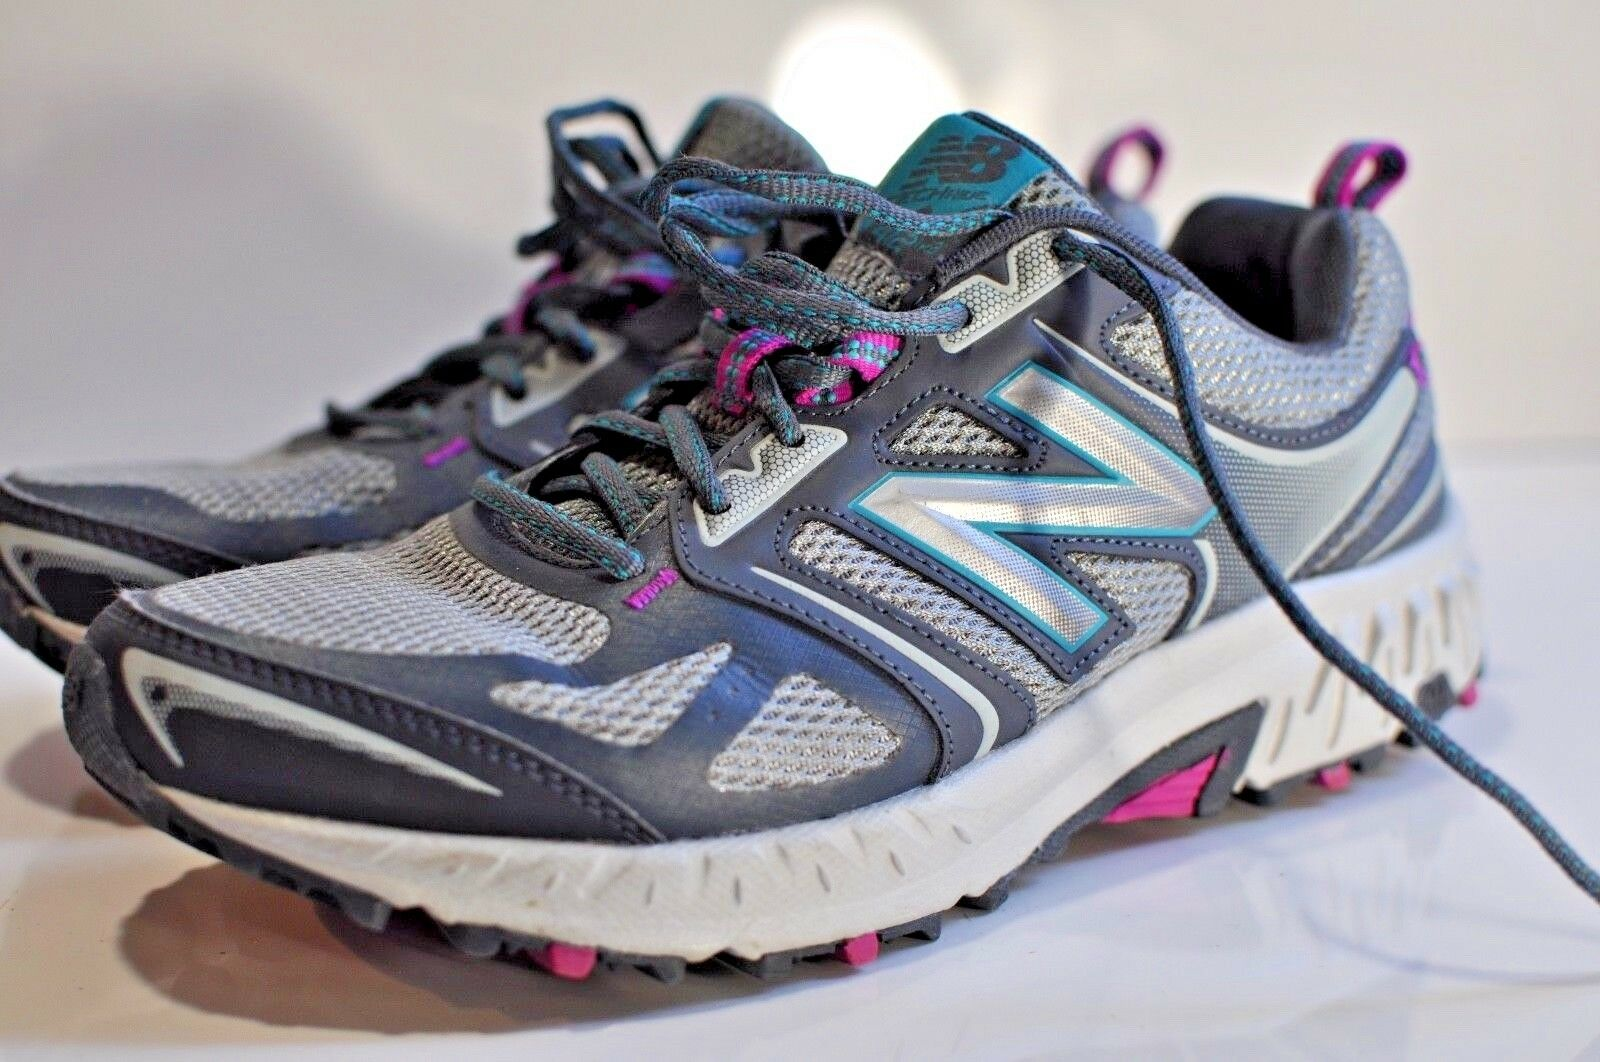 New Balance donna 412 v3 All All All Terrain Techaide acteva trail scarpe 9.5 ac13f3